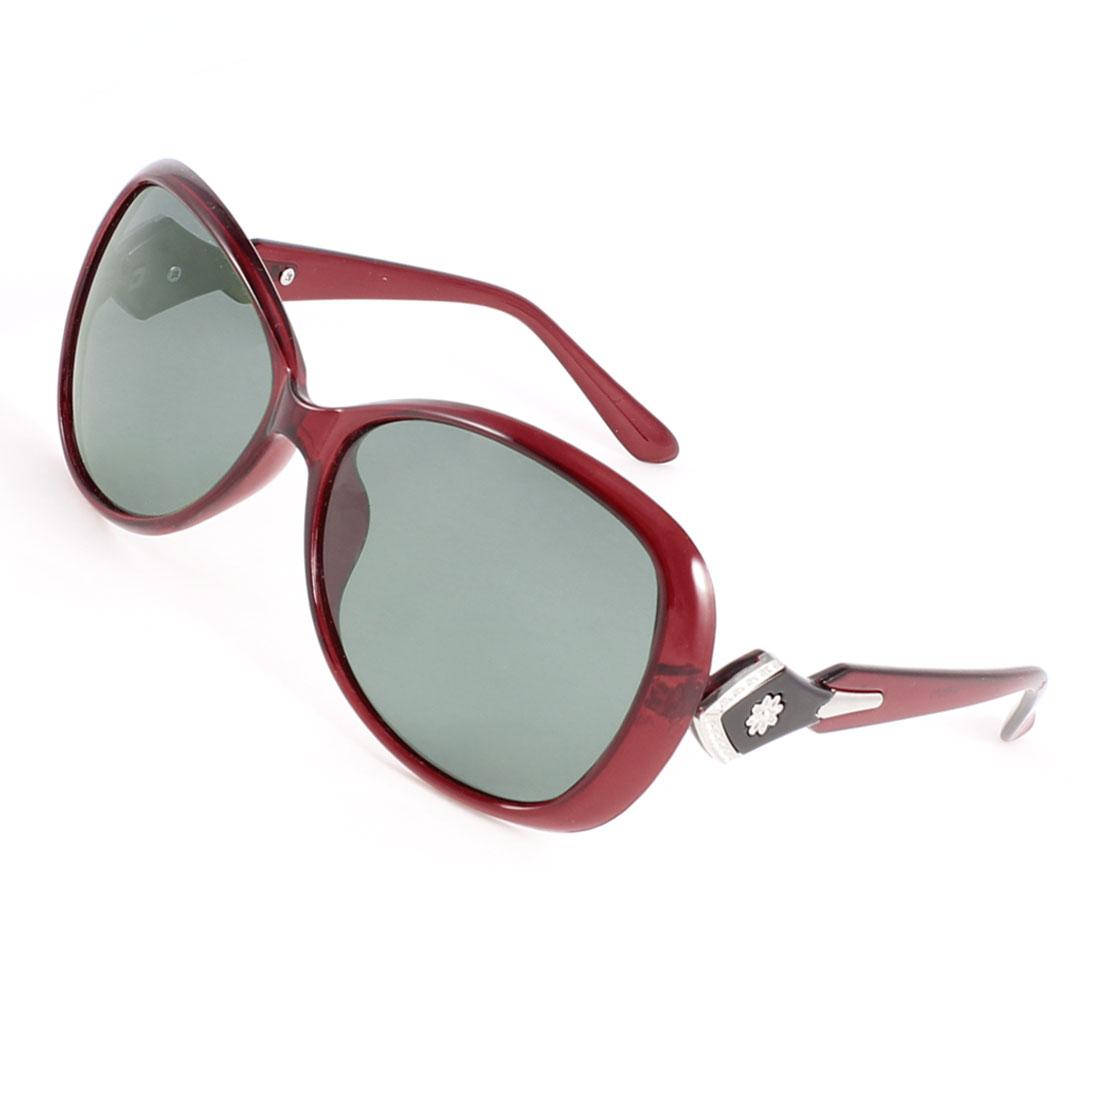 Woman Red Plastic Flower Decor Arms Full Frame Single Bridge Polarized Sunglasses